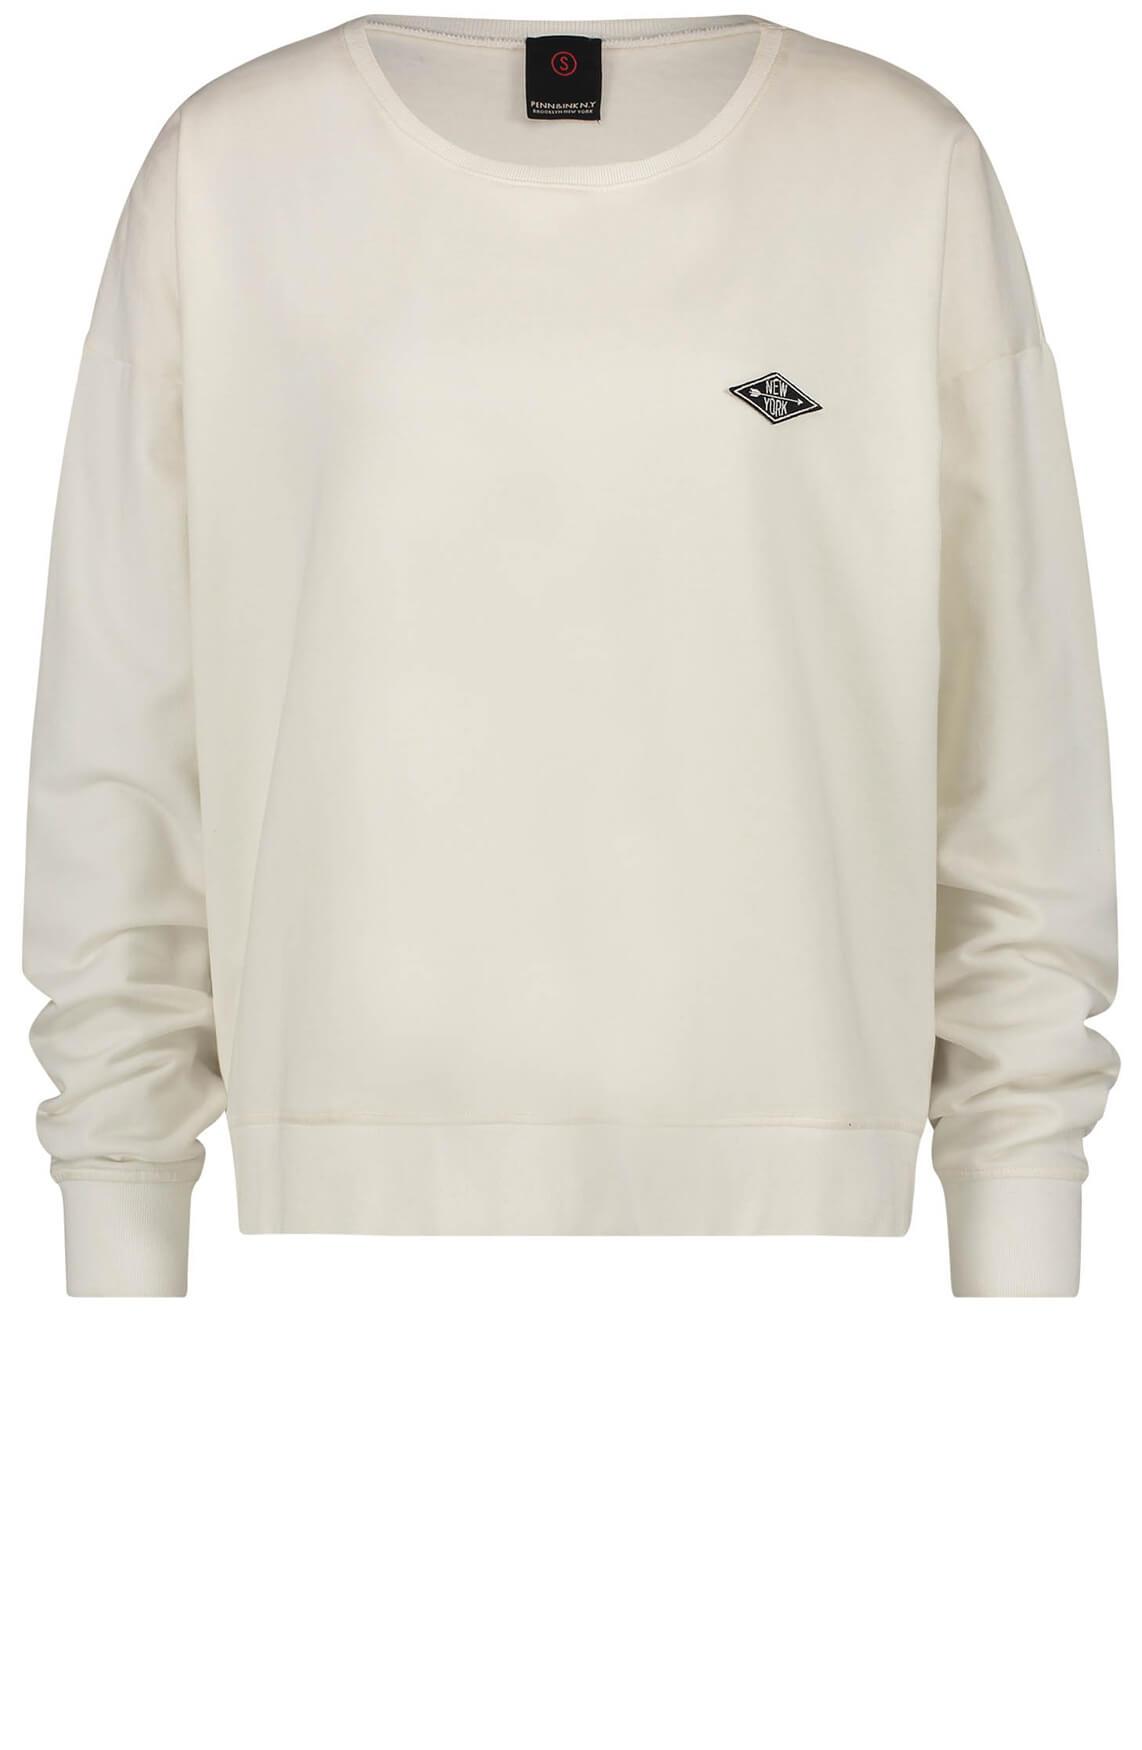 Penn & Ink Dames Sweater met tekstopdruk wit